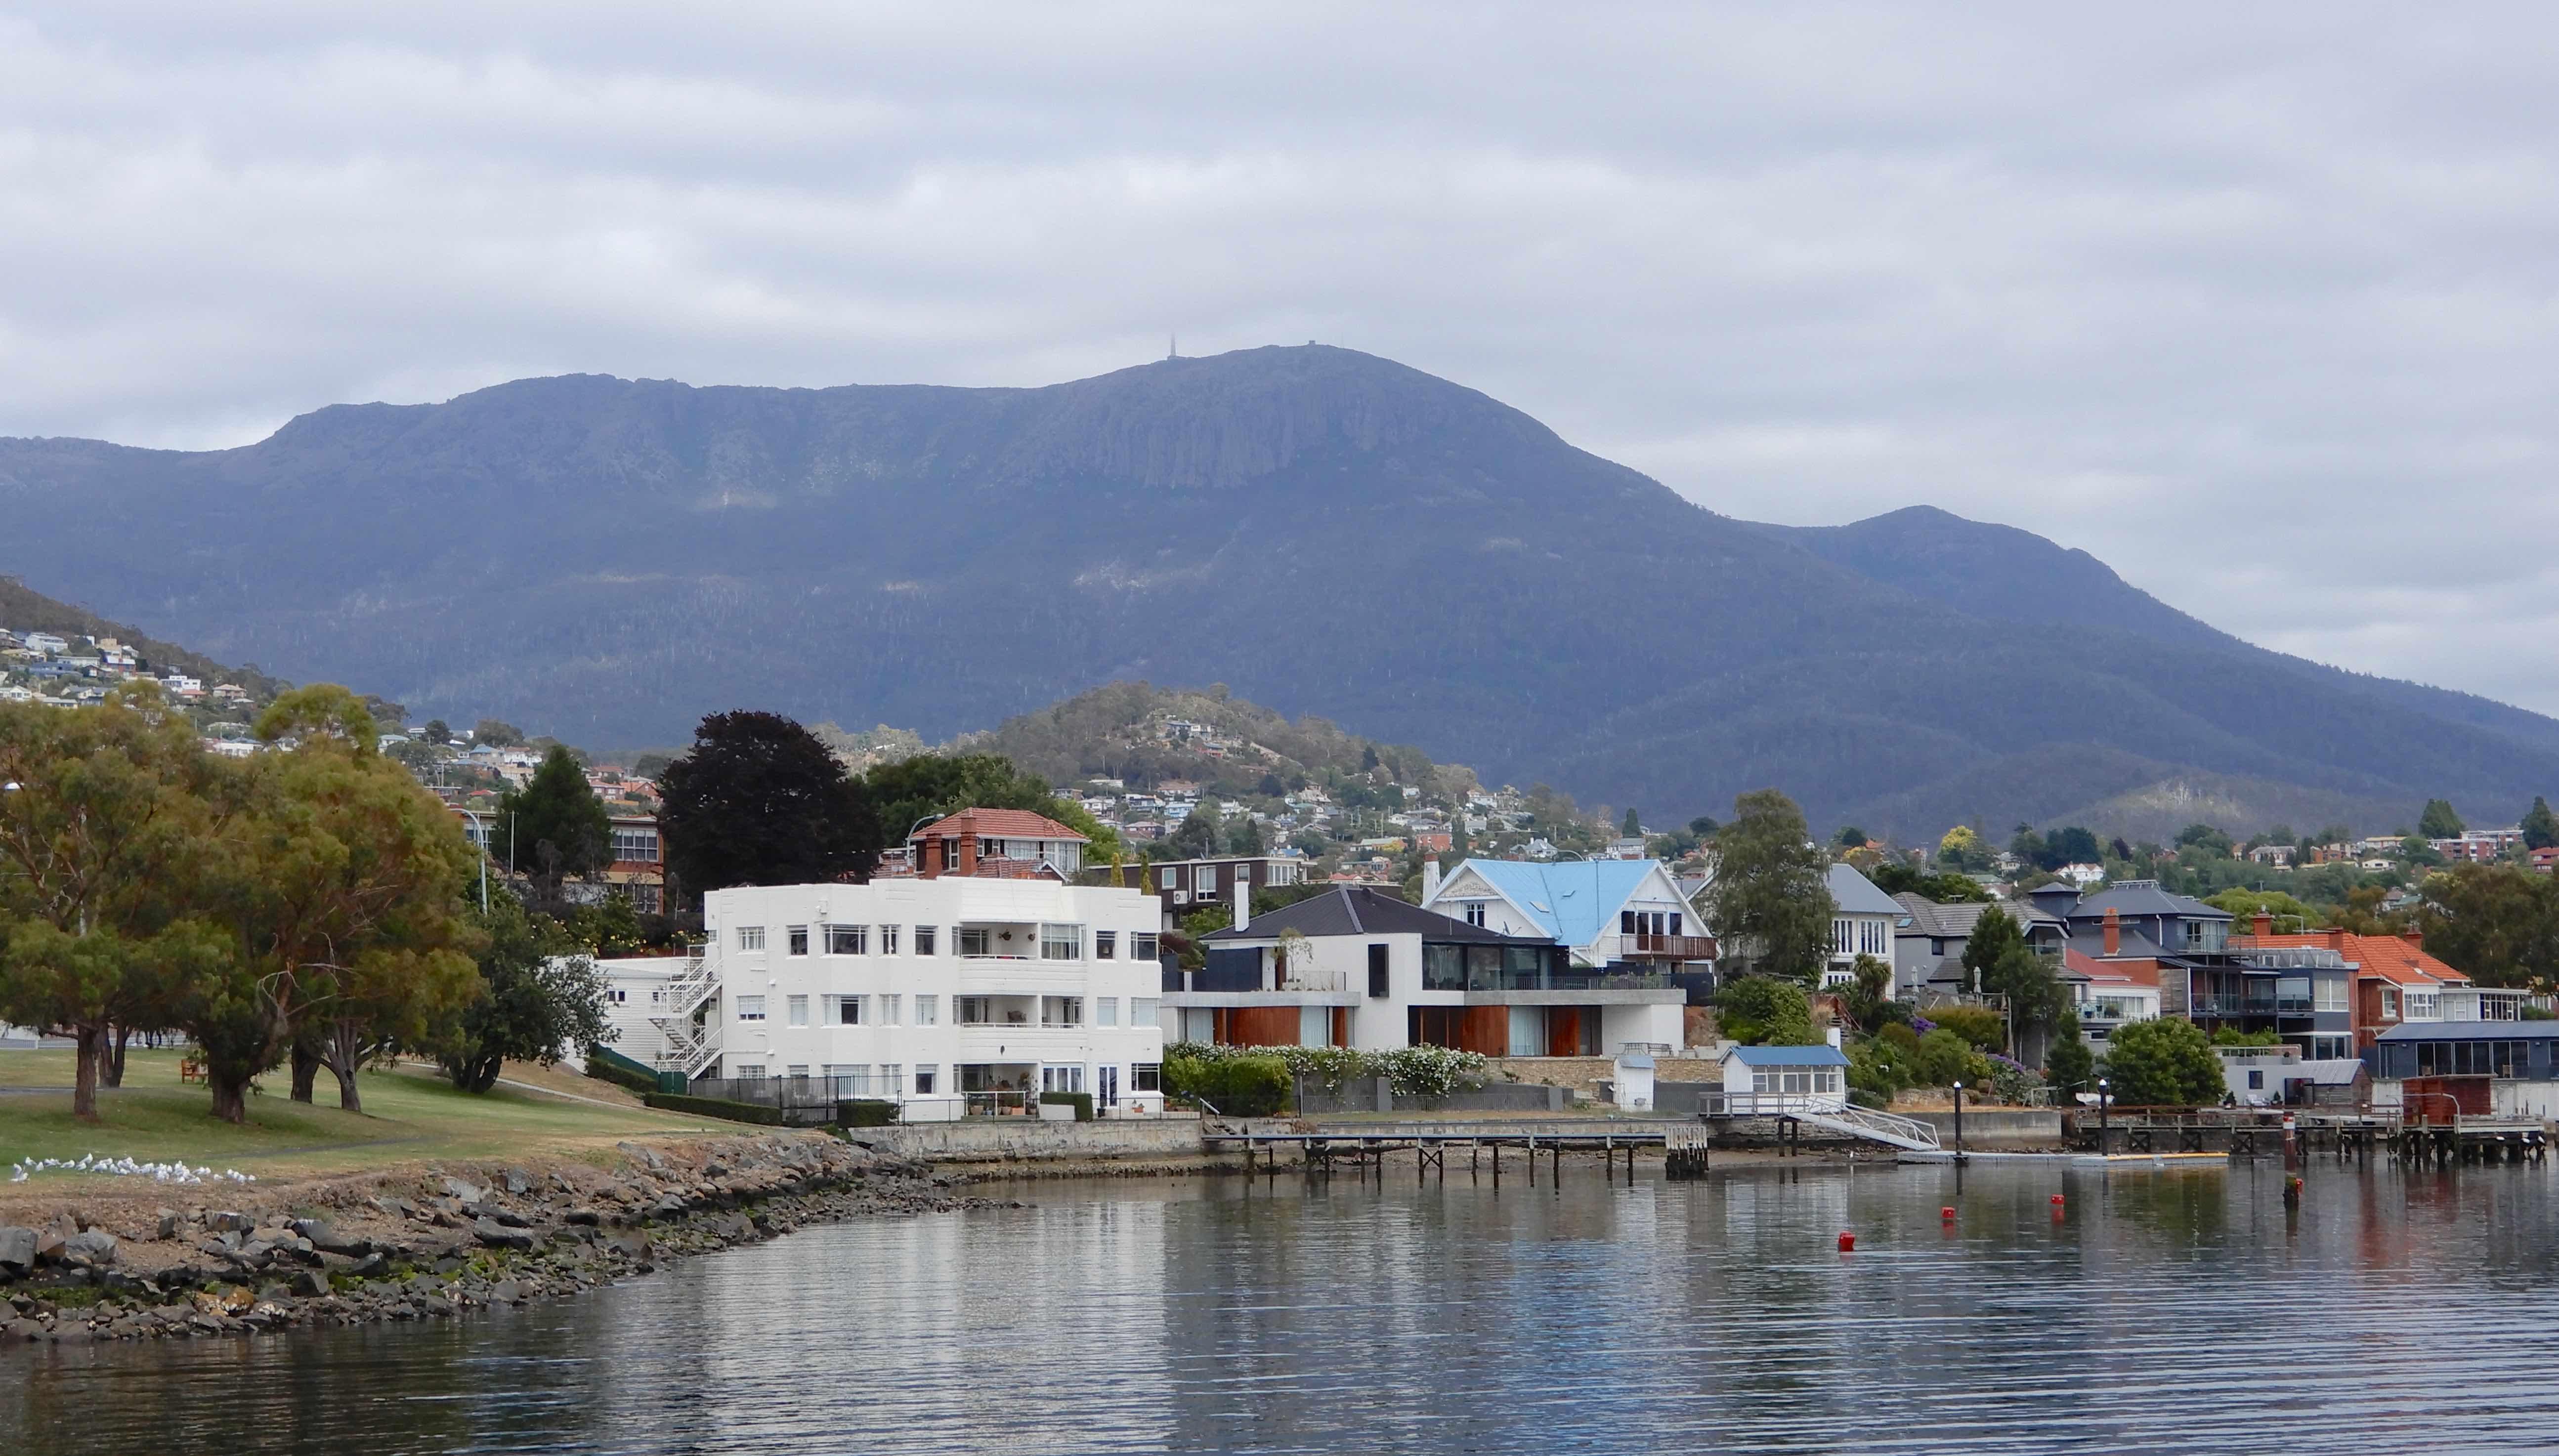 41.Sandy Bay